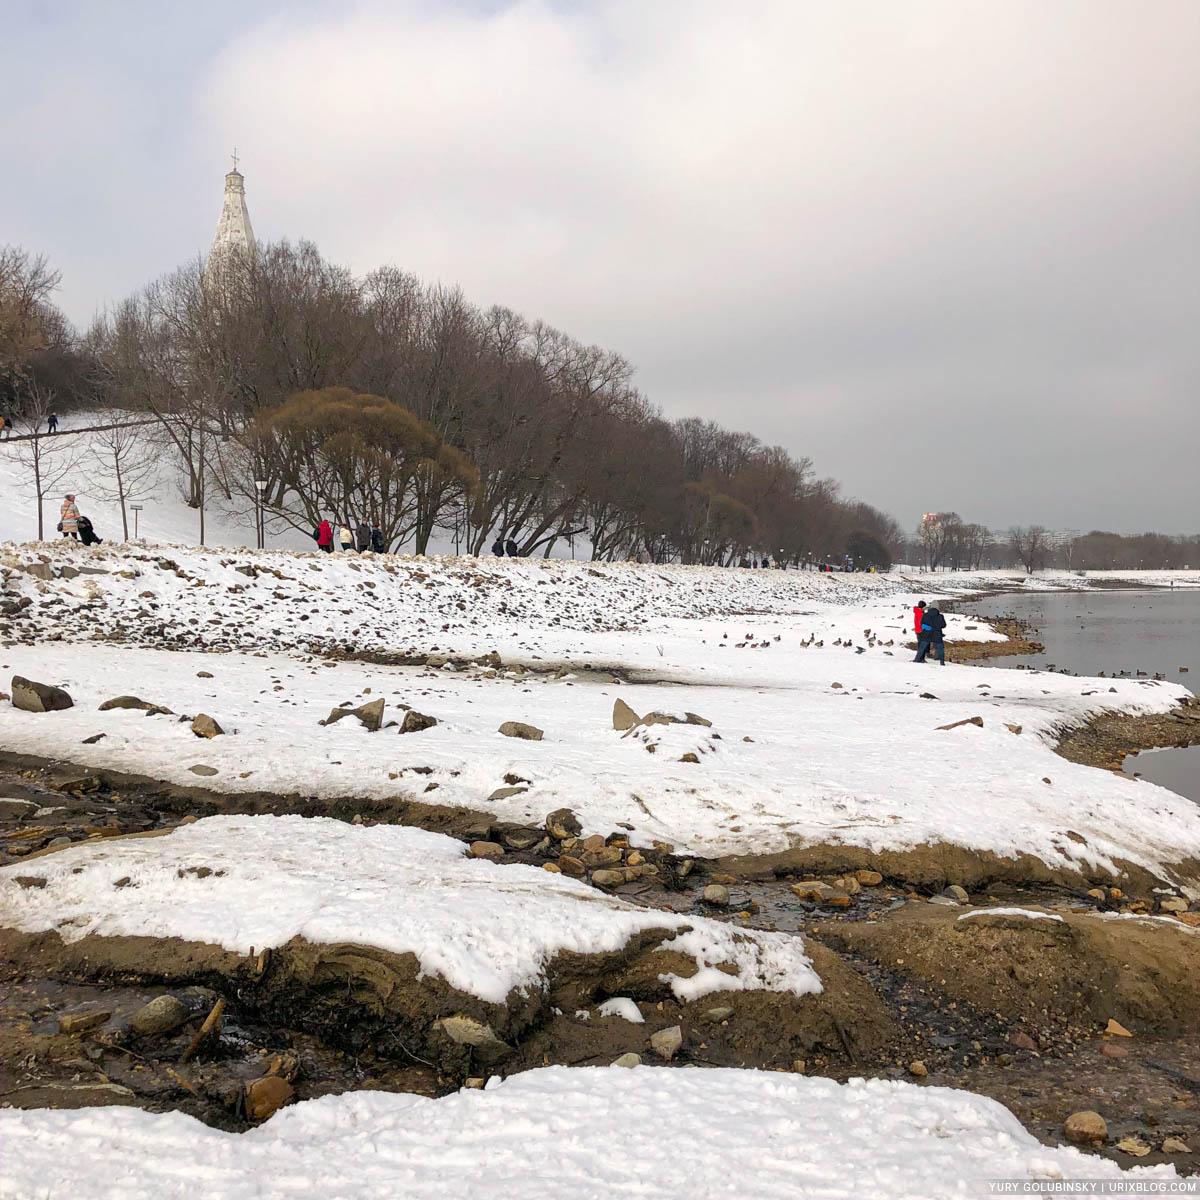 Kolomenskoye park, Moskva river, Moscow, Russia, 2020